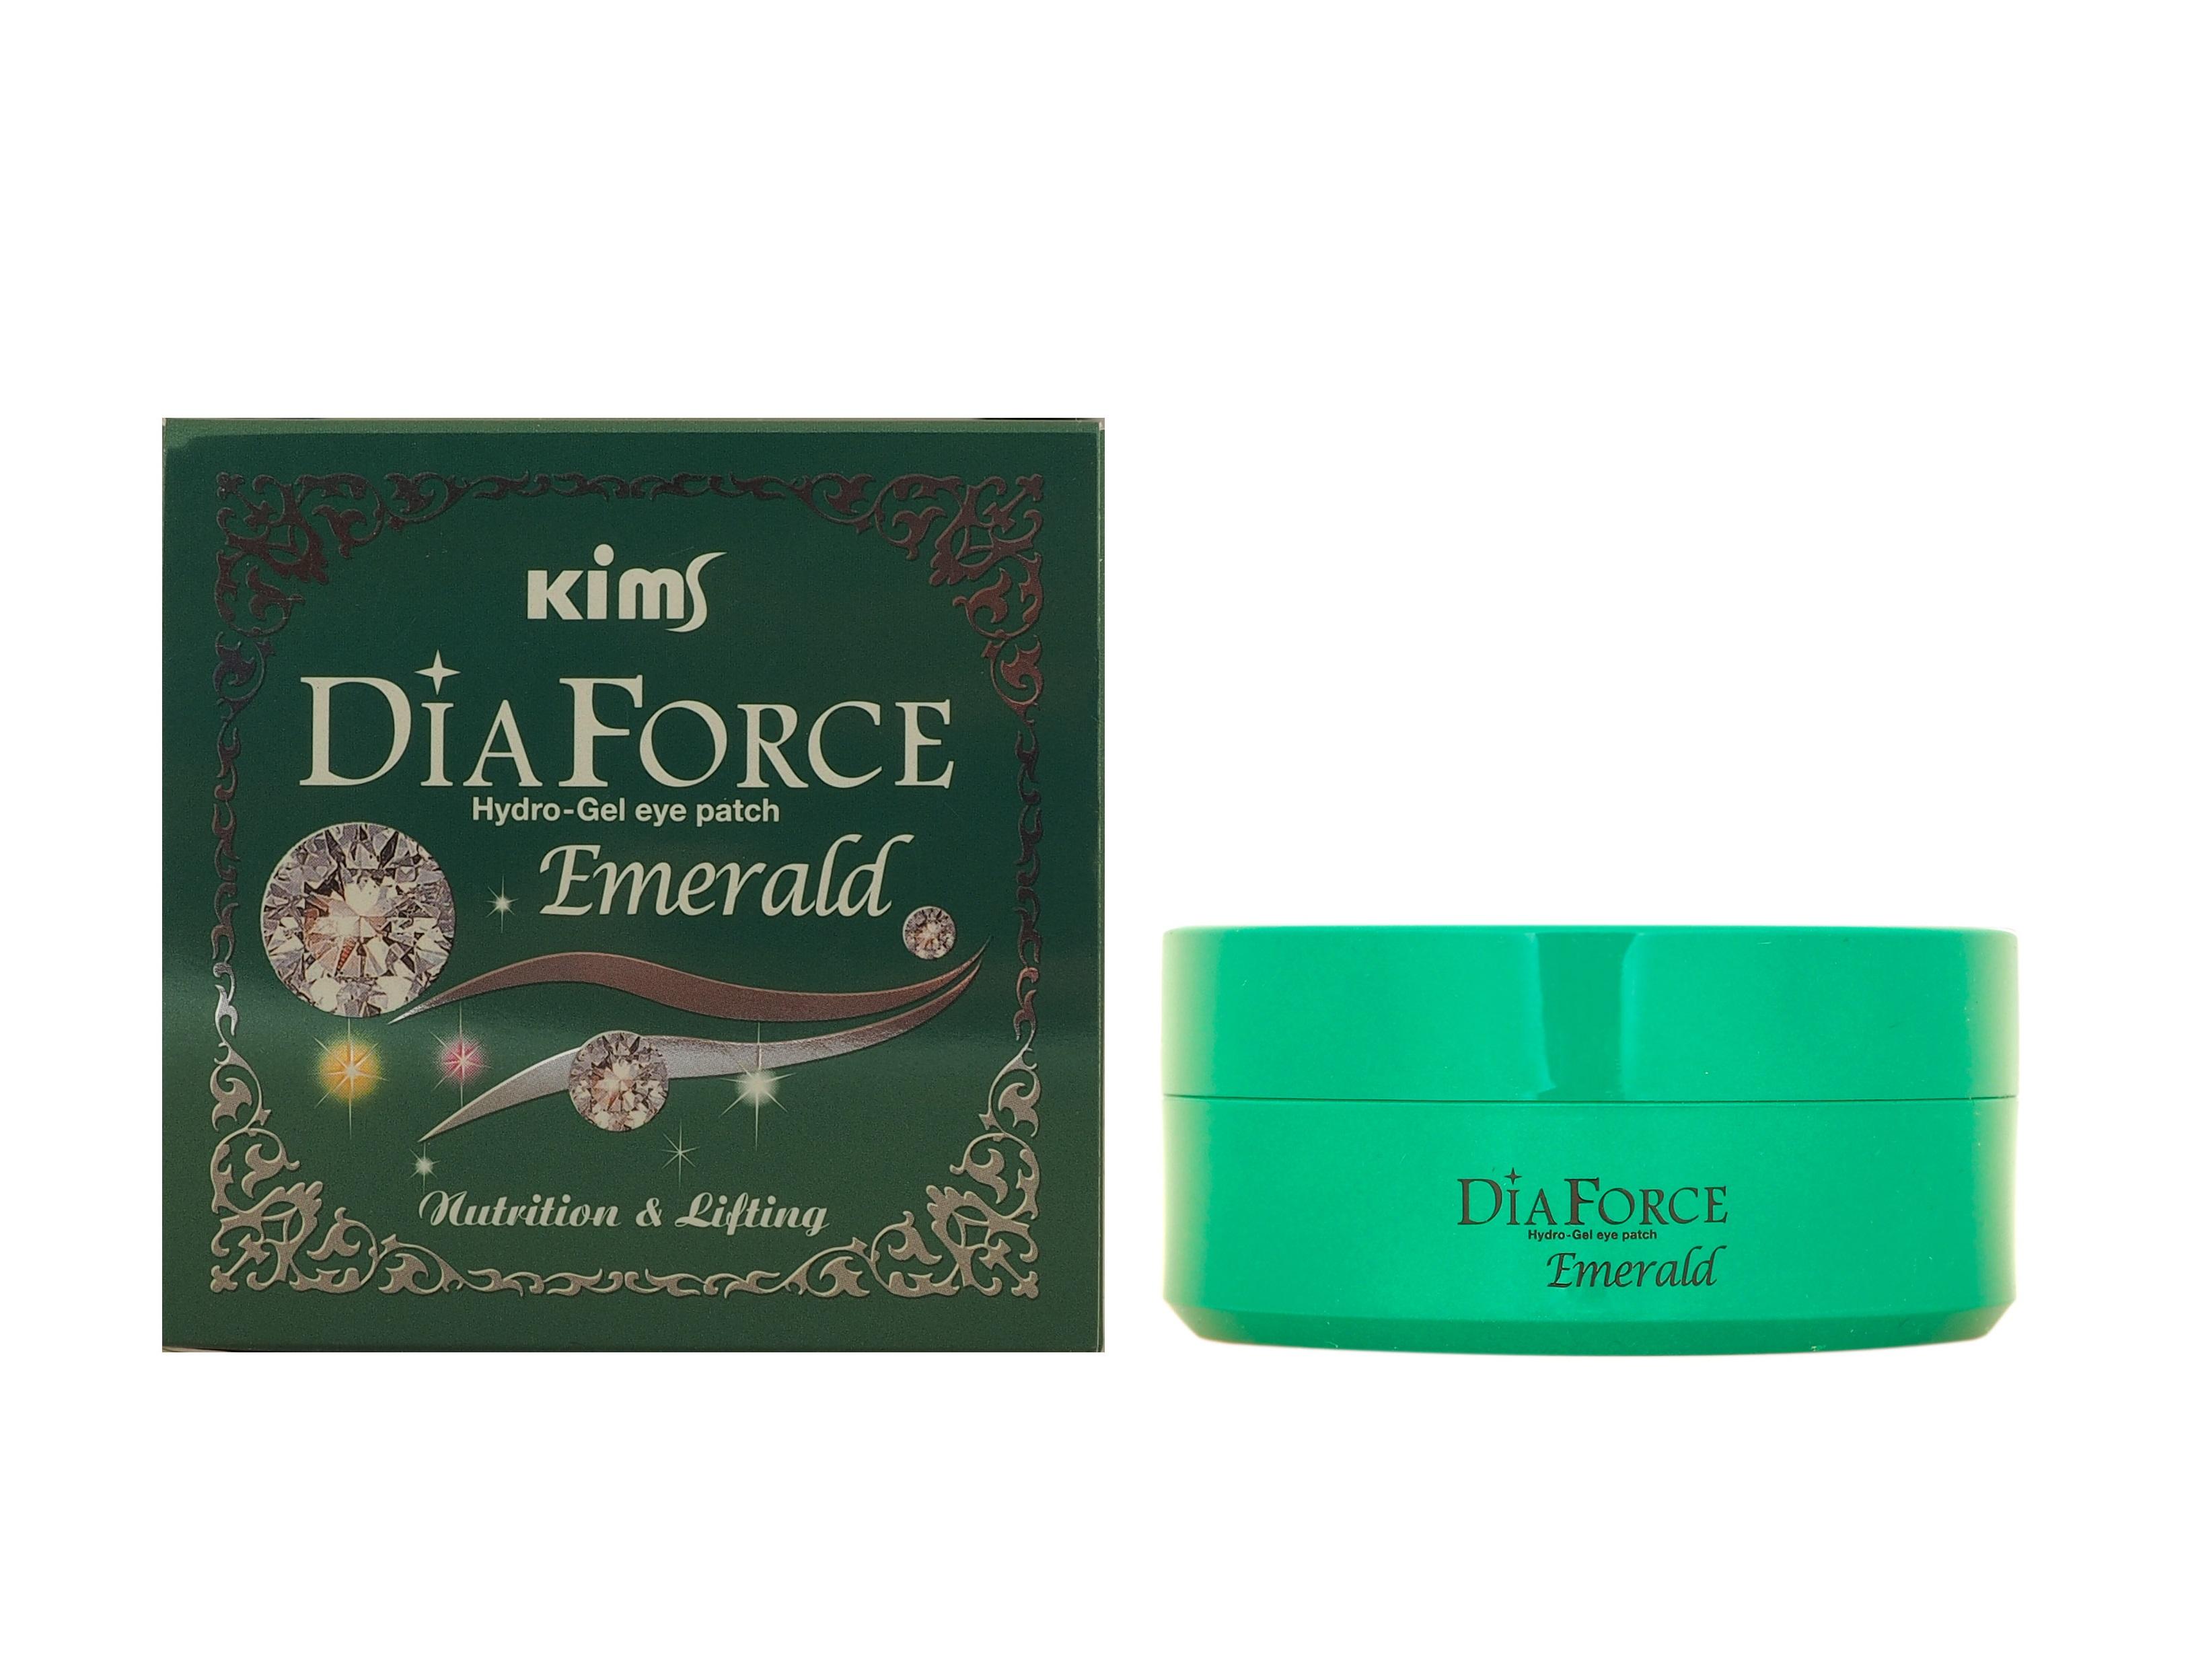 KIMS Патчи гидрогелевые Сила Изумруда / Dia Force Emerald Hydro-Gel Eye Patch 60 шт  - Купить